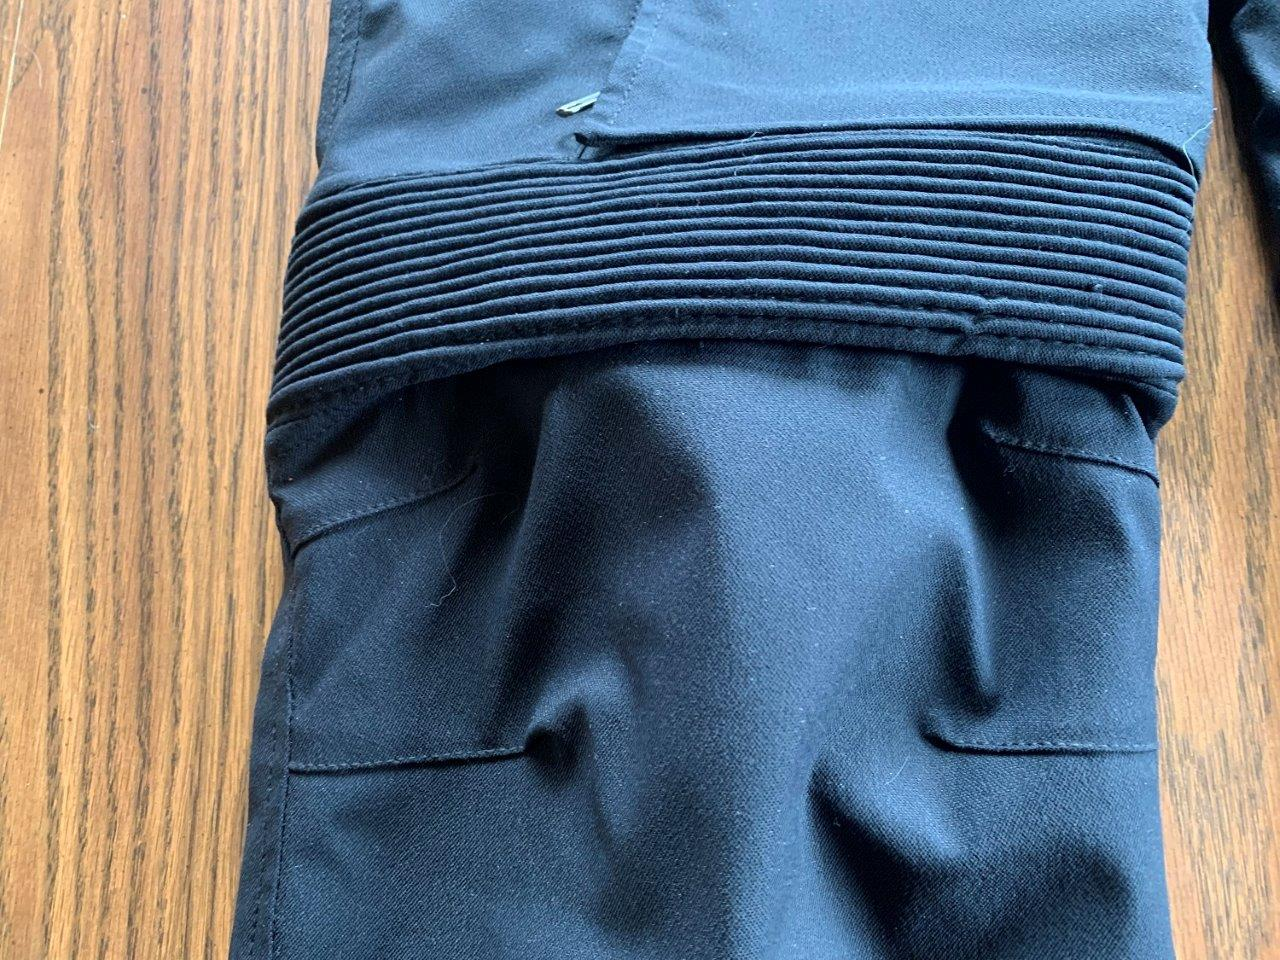 Knee Stretch Panel of Raven Rova Raven Pants